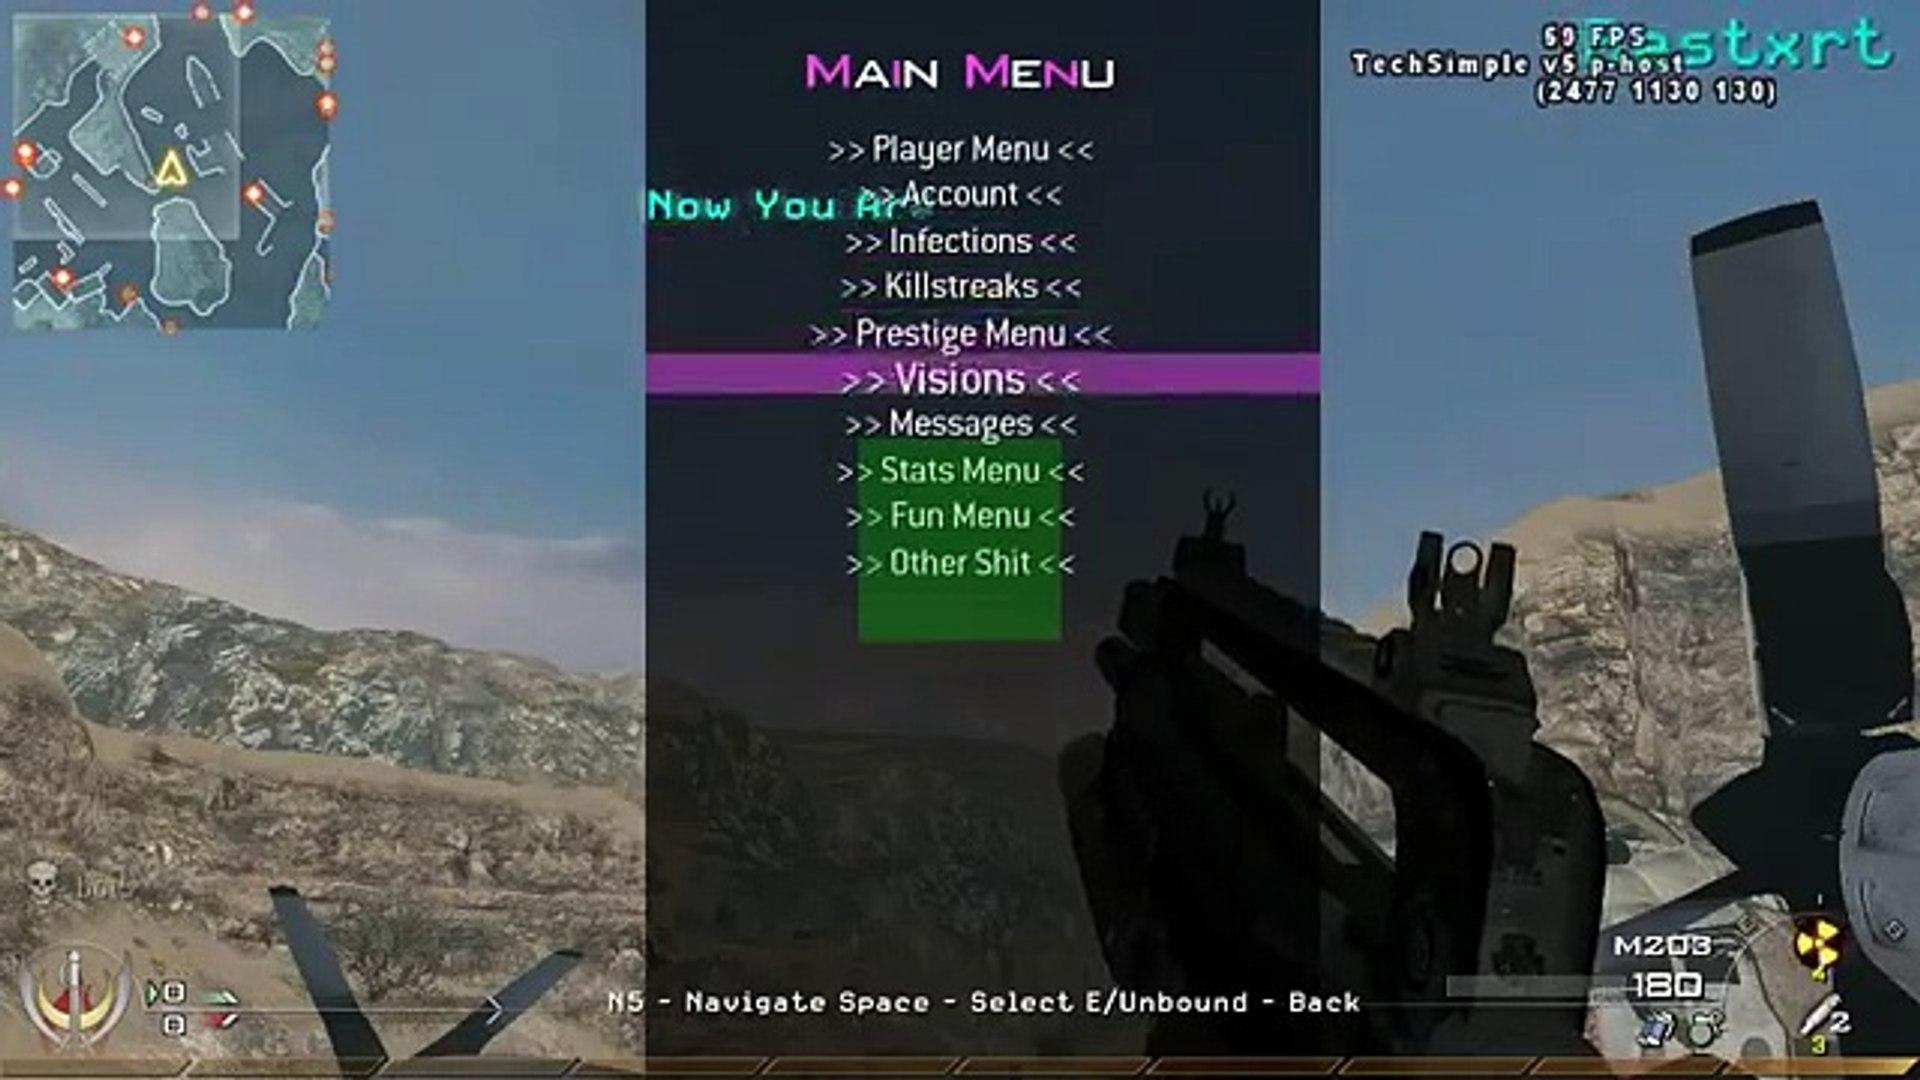 Mw3 Mod Menu Pc Steam 2019